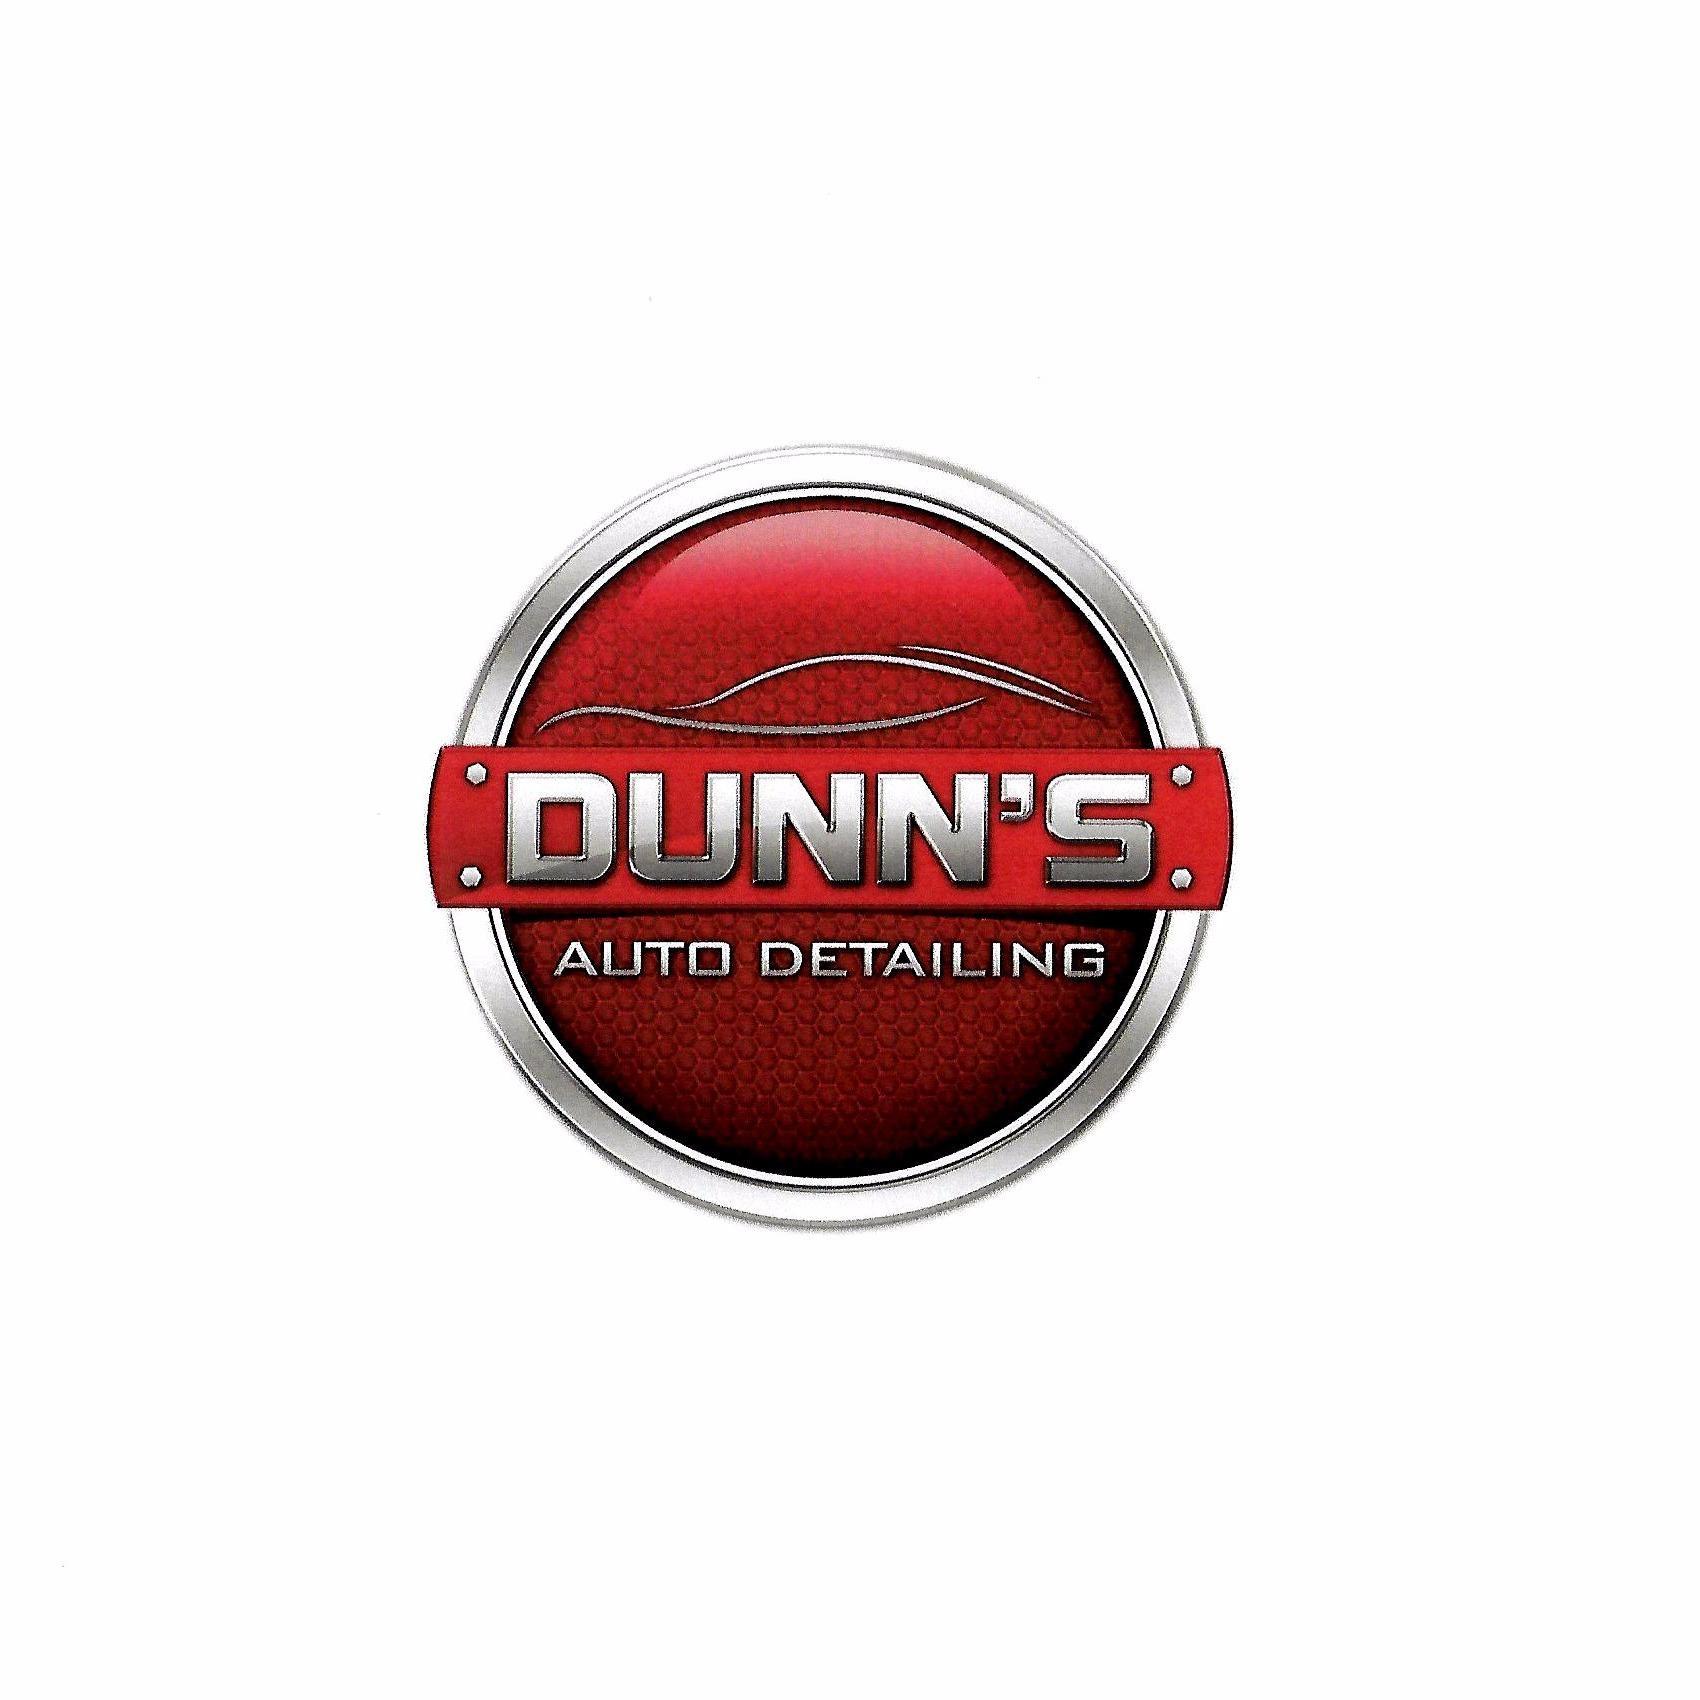 Dunns Auto Detailing, LLc